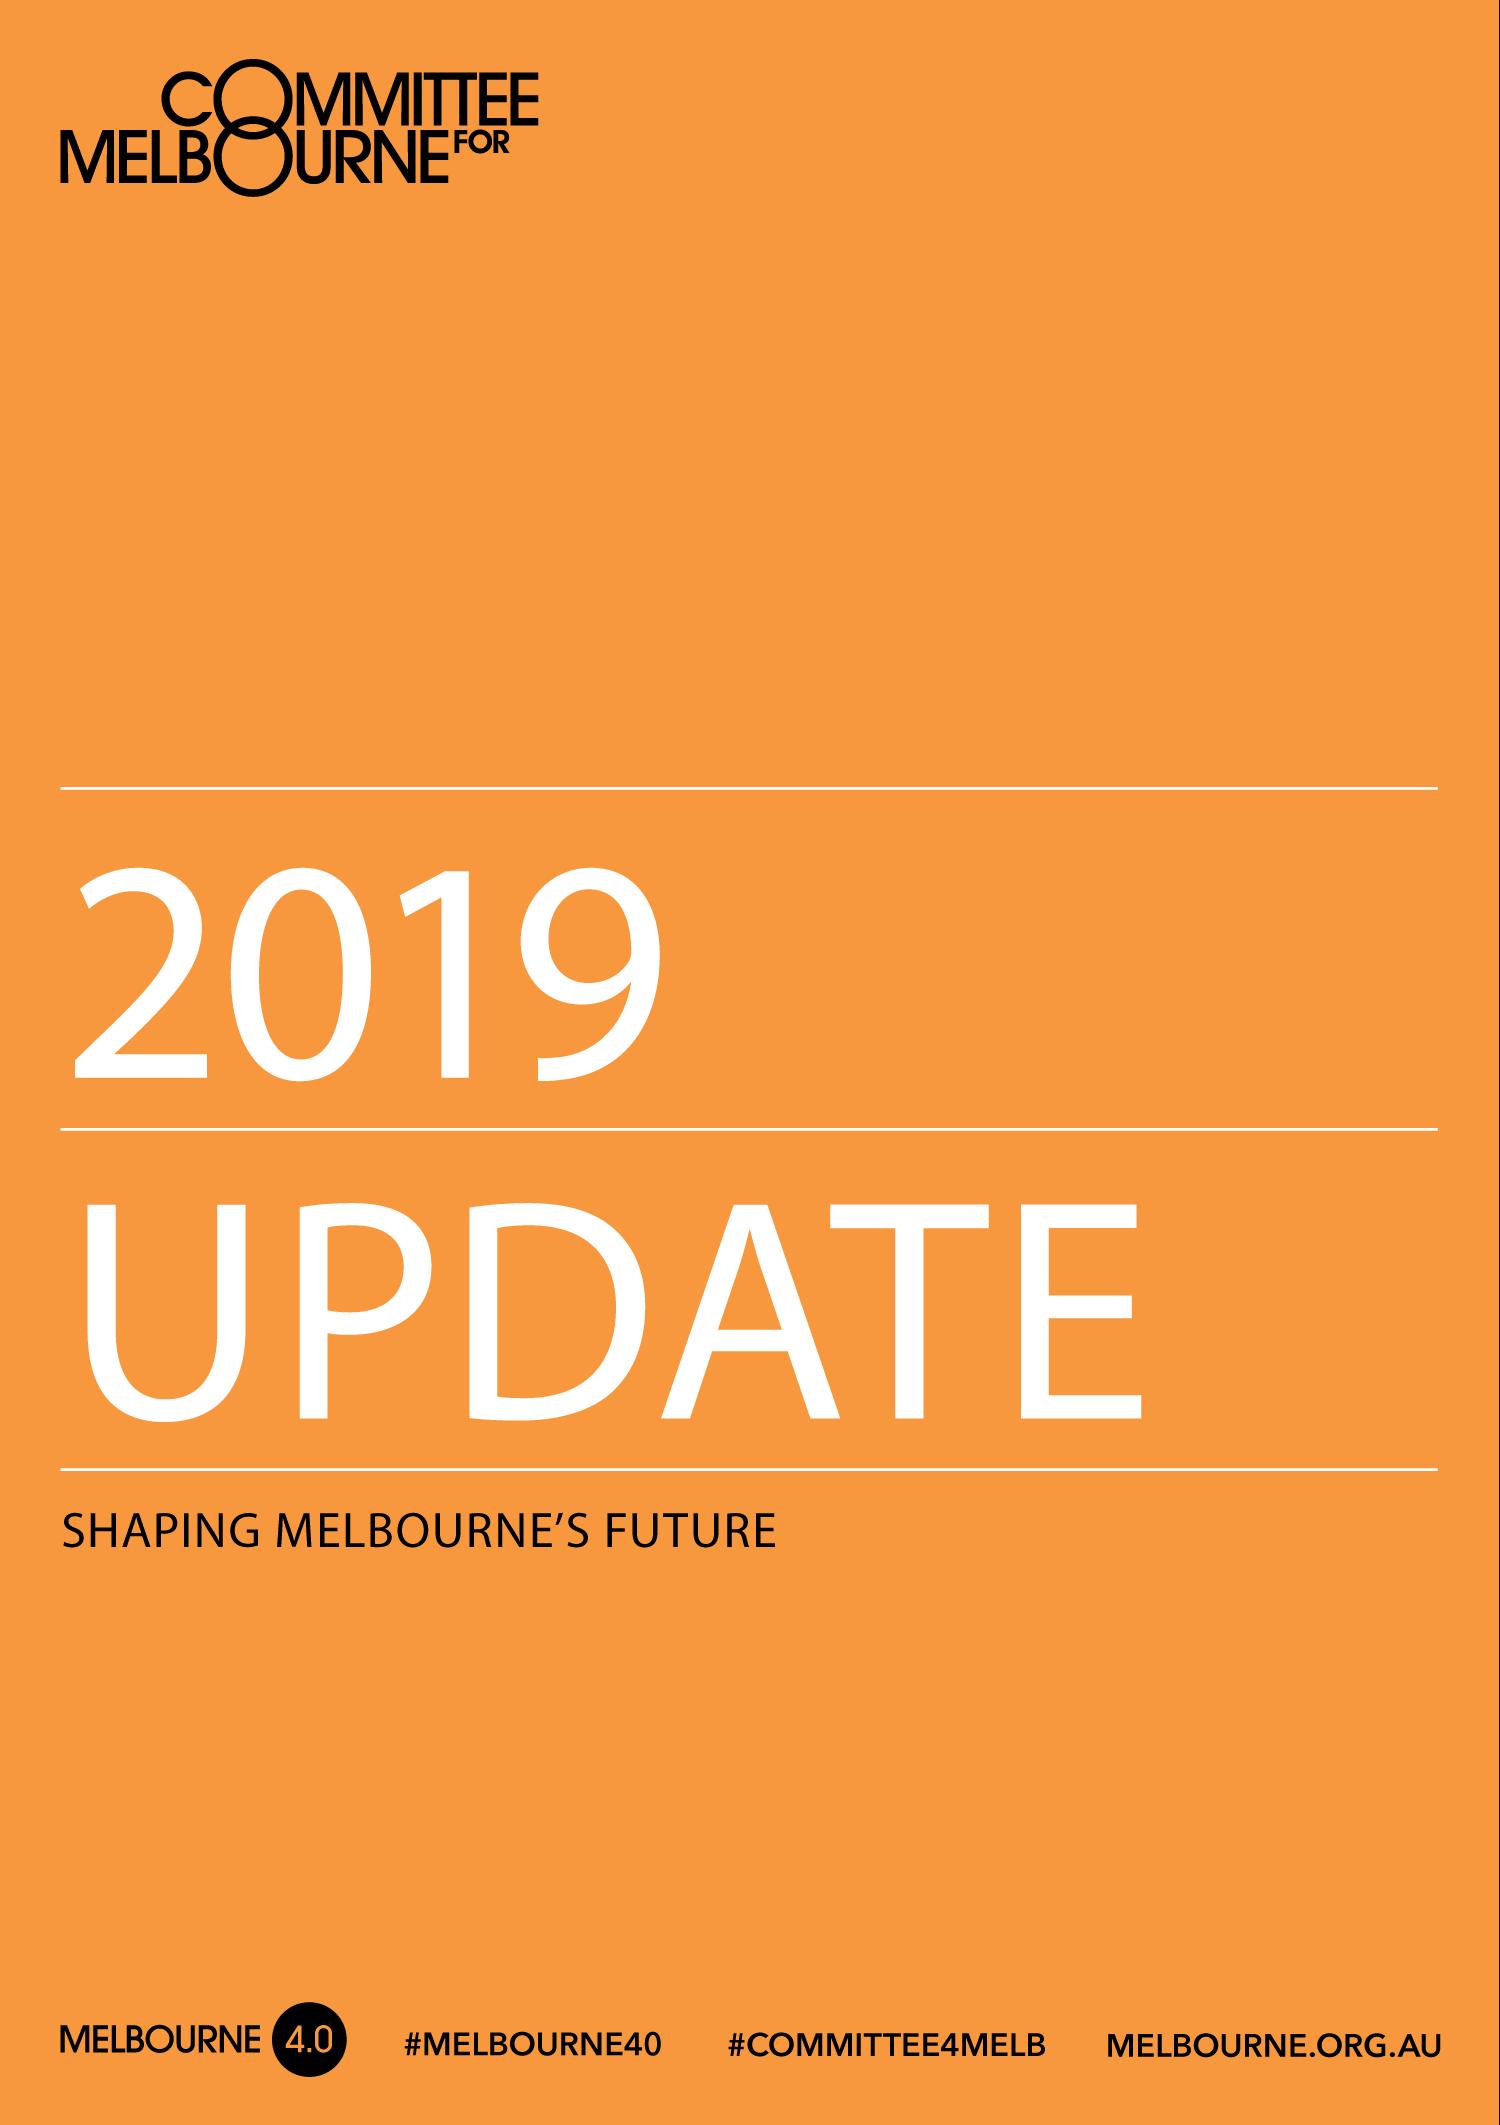 MELC12412_Activity_Report_2019.png